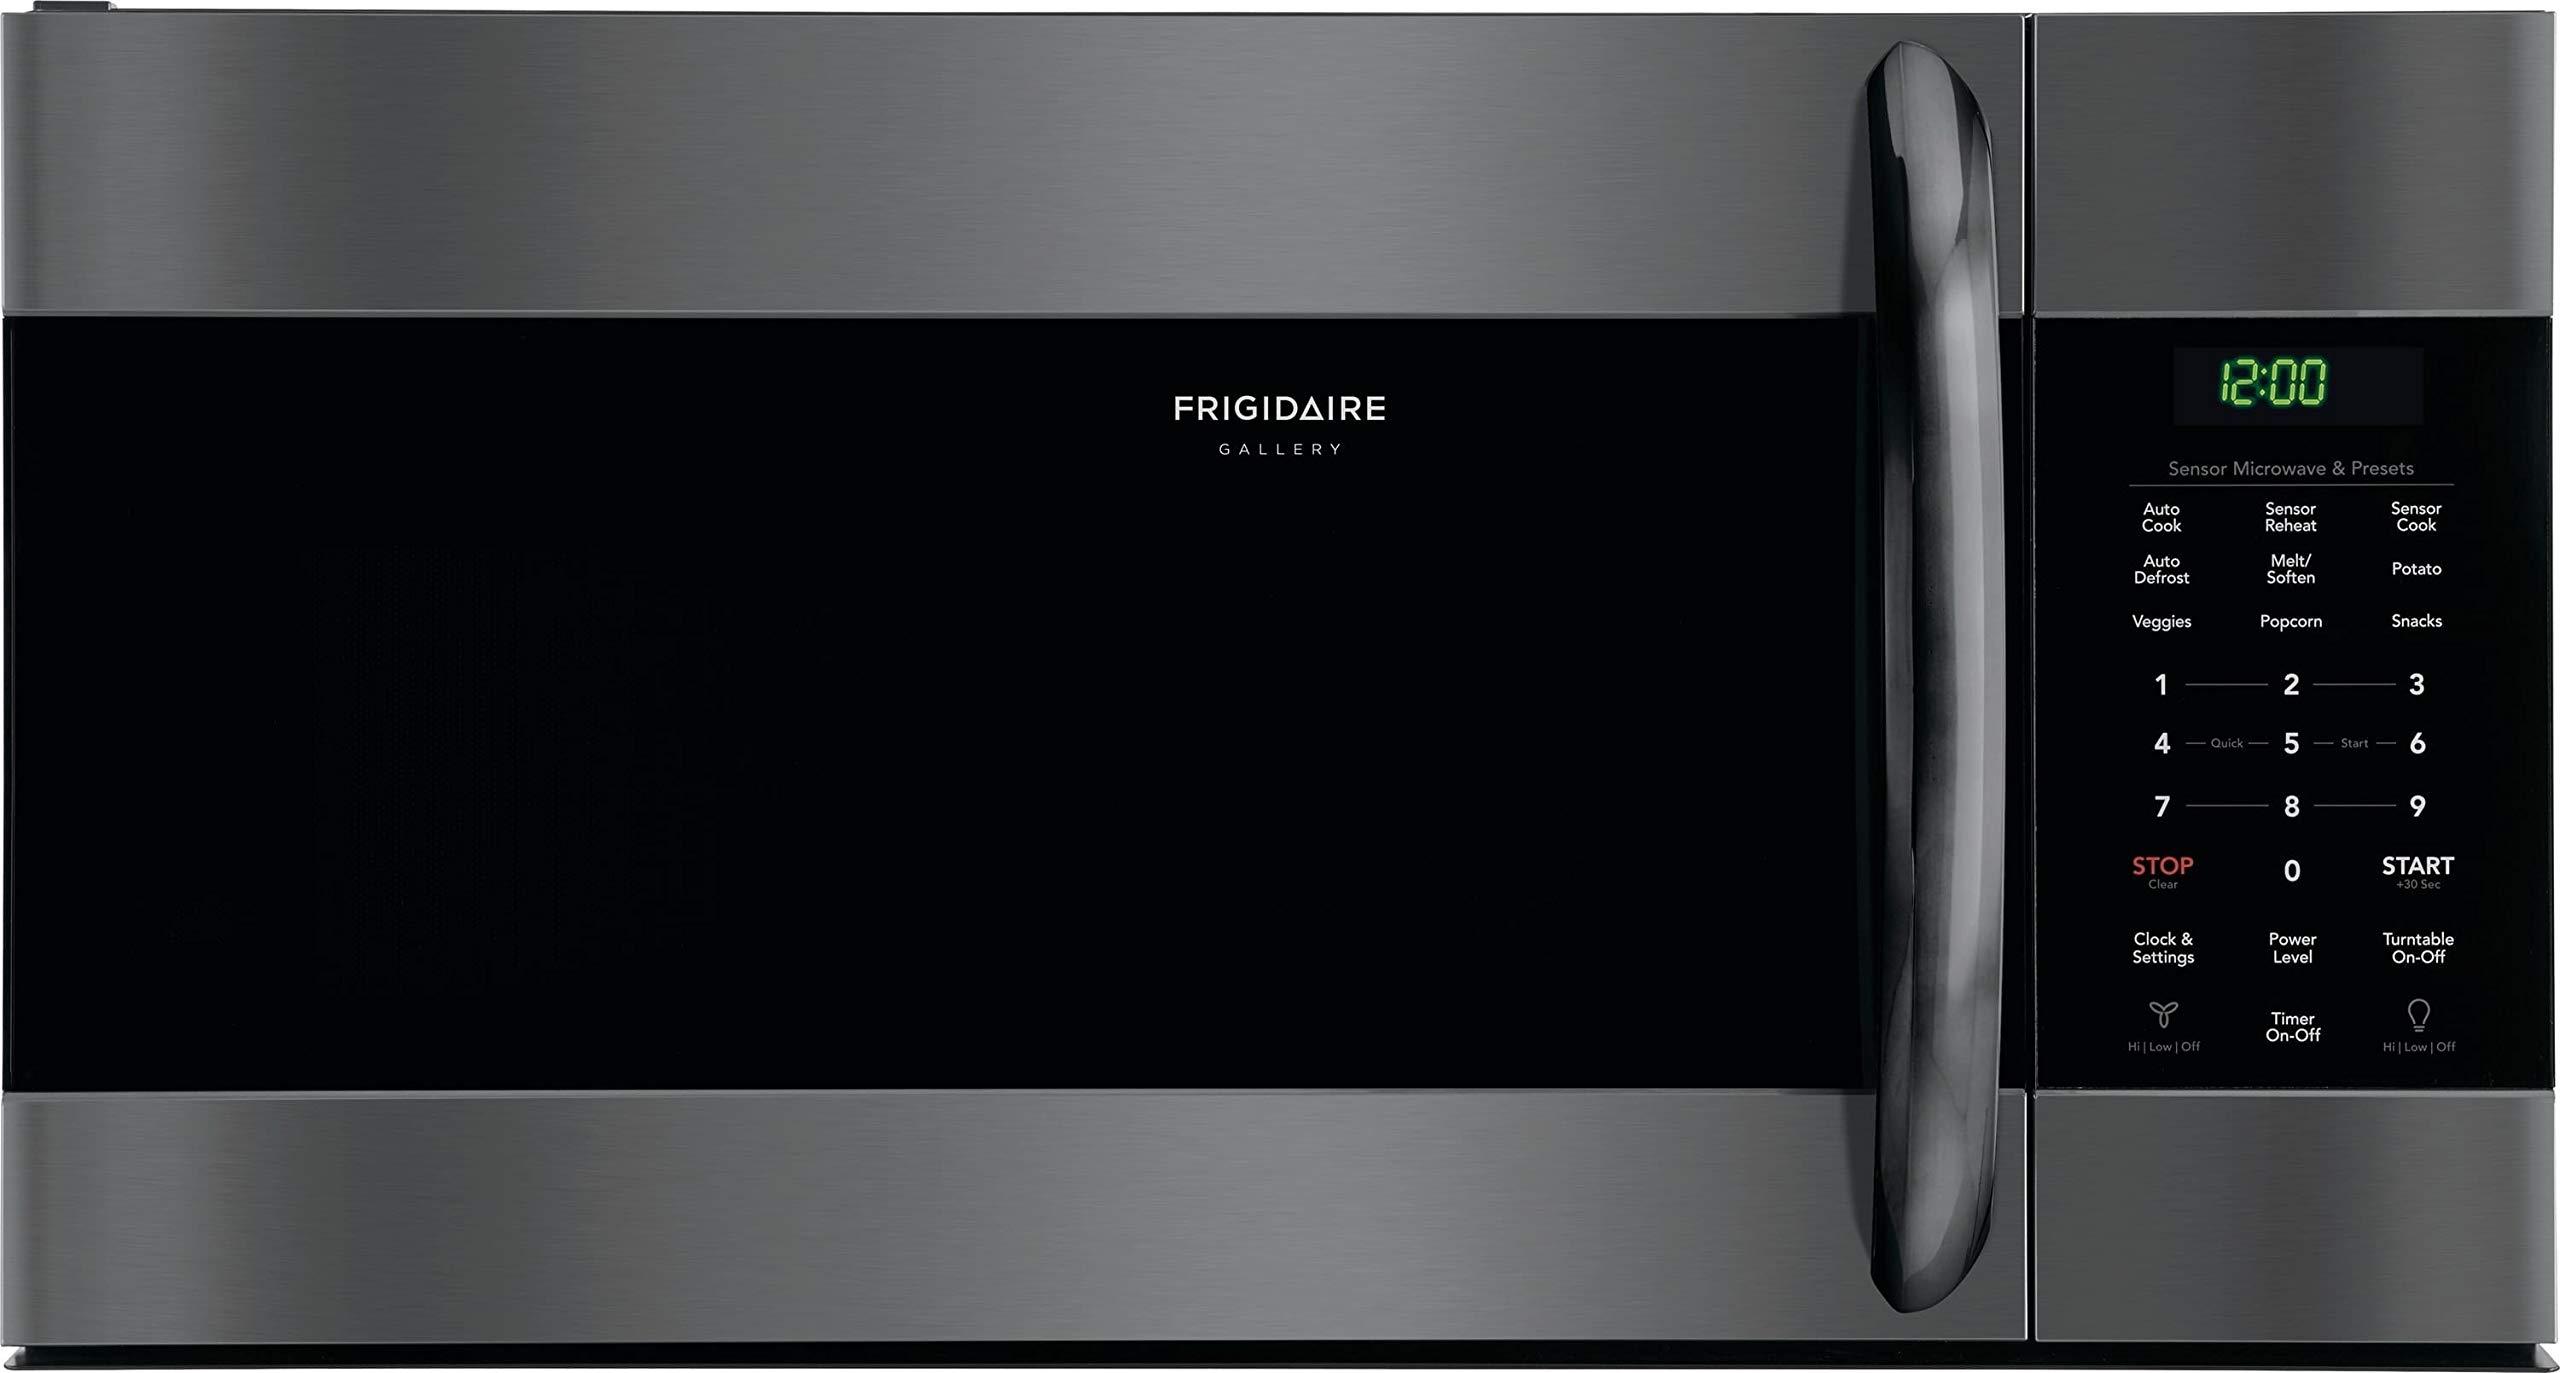 Frigidaire Gallery Stainless Range Microwave